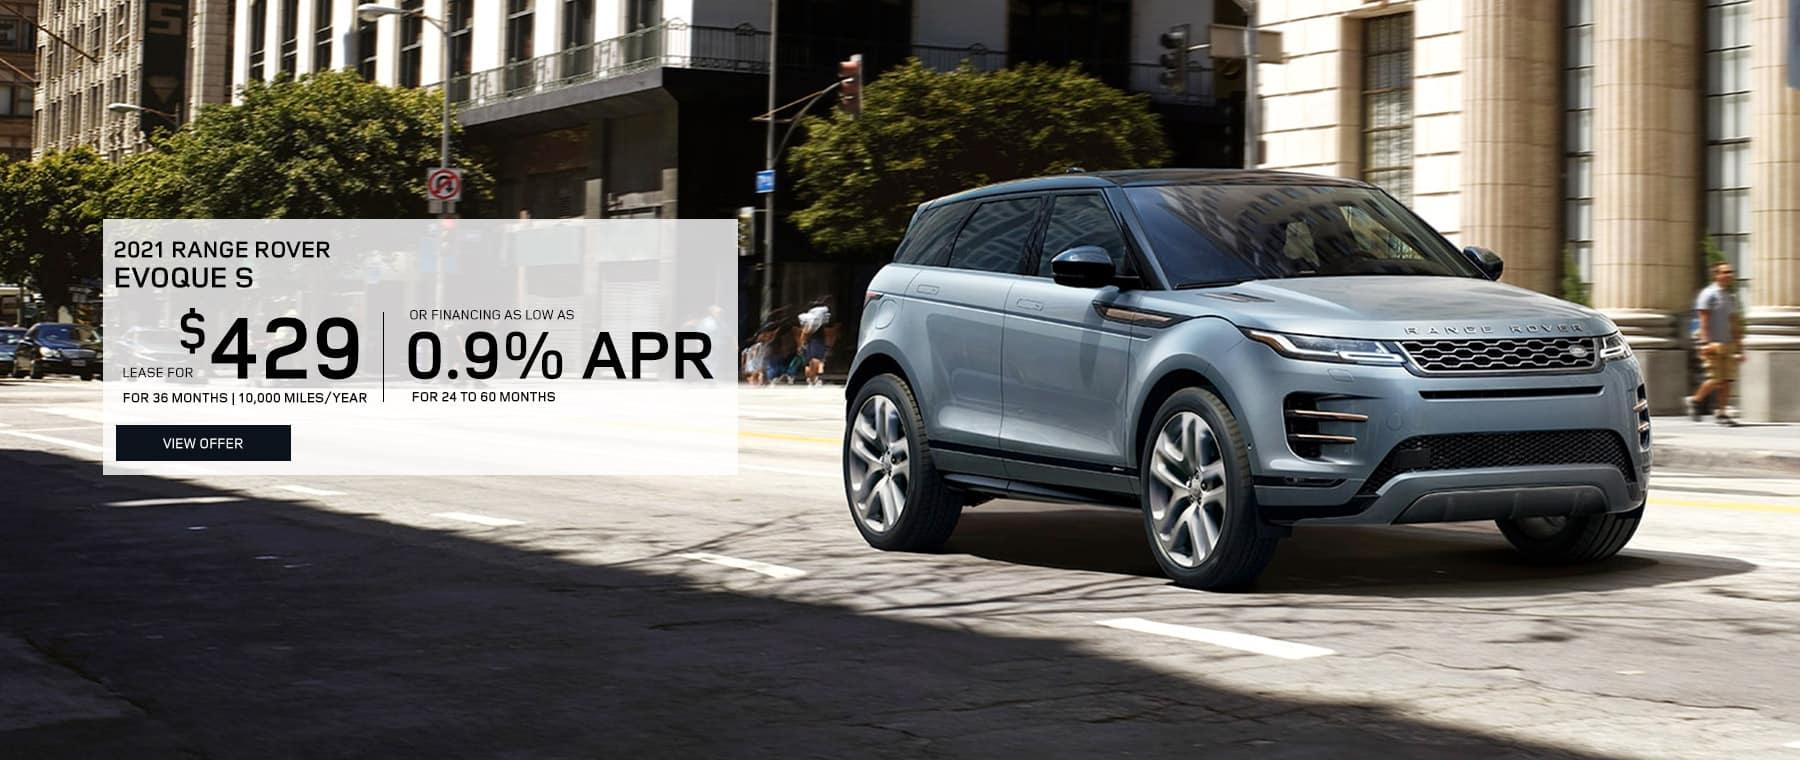 2021 Range Rover Evoque-feb-2021